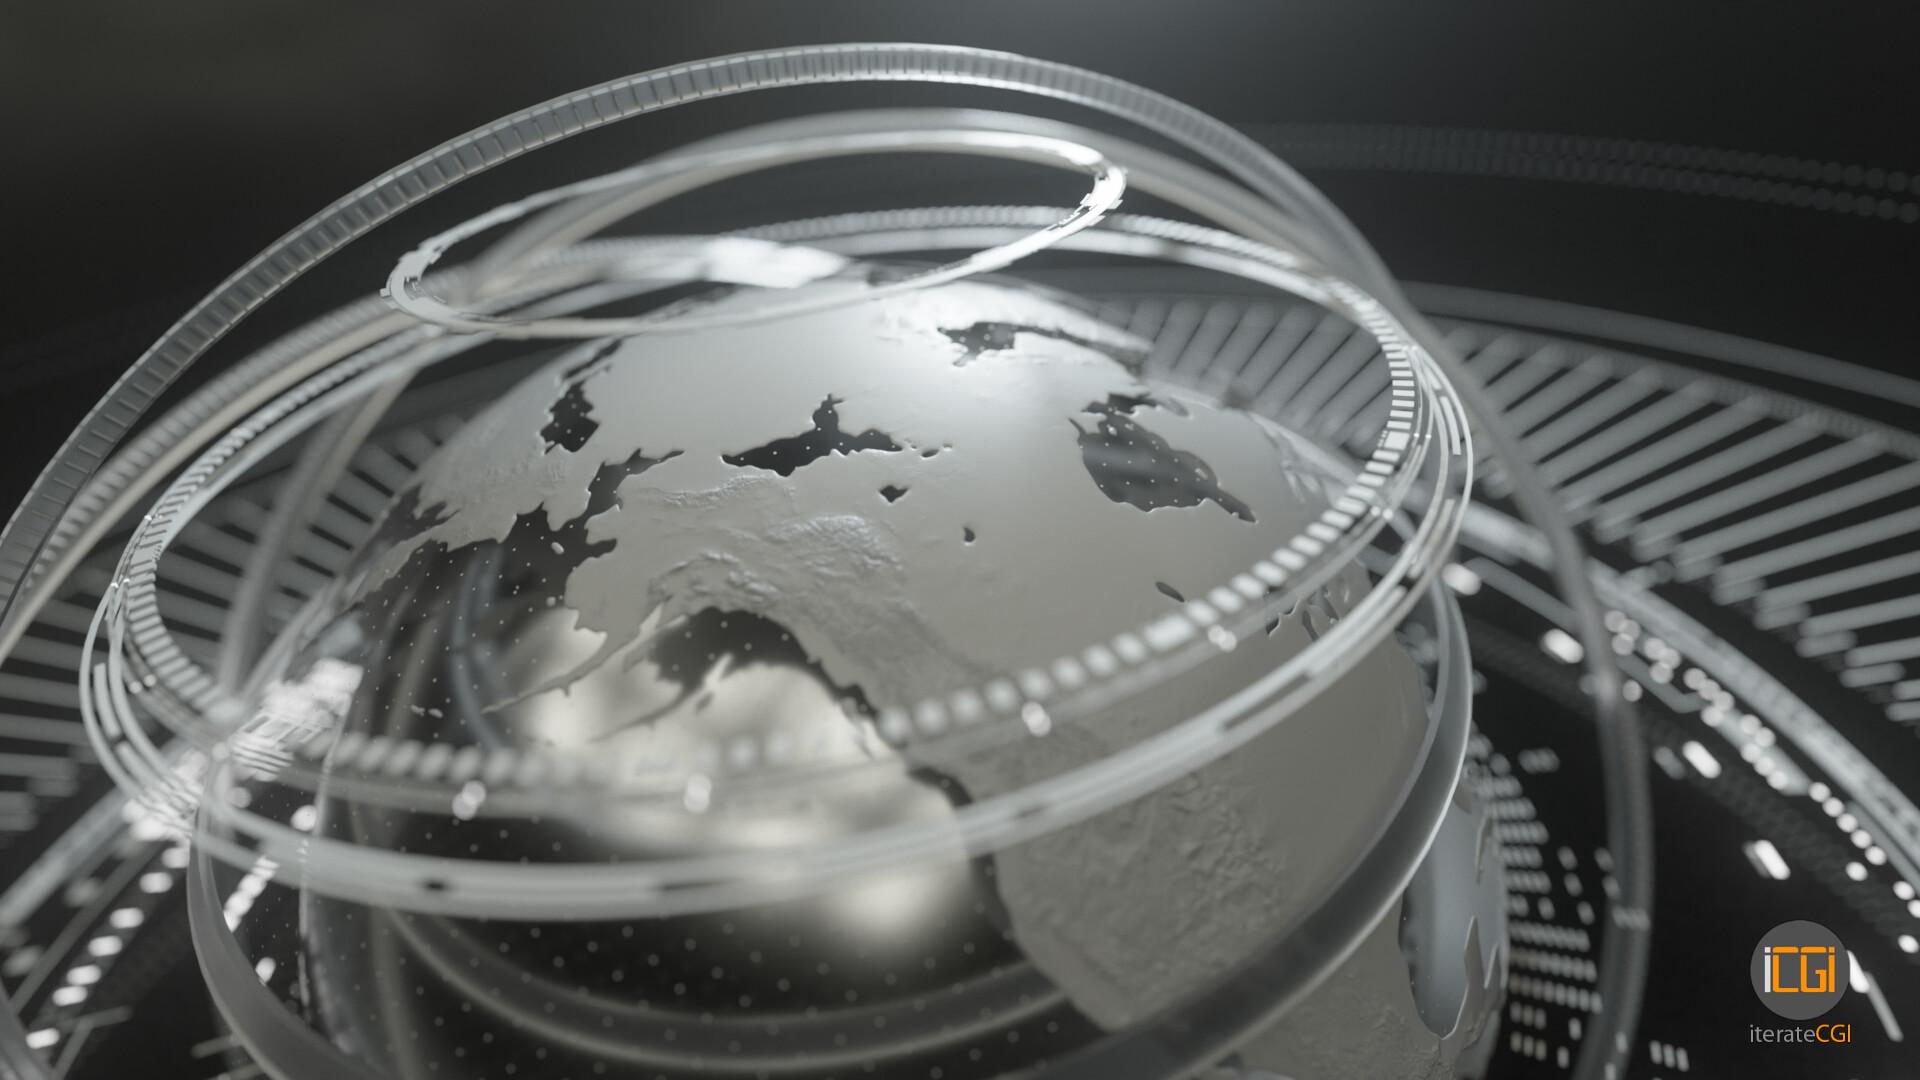 Johan de leenheer globe motion graphic 11